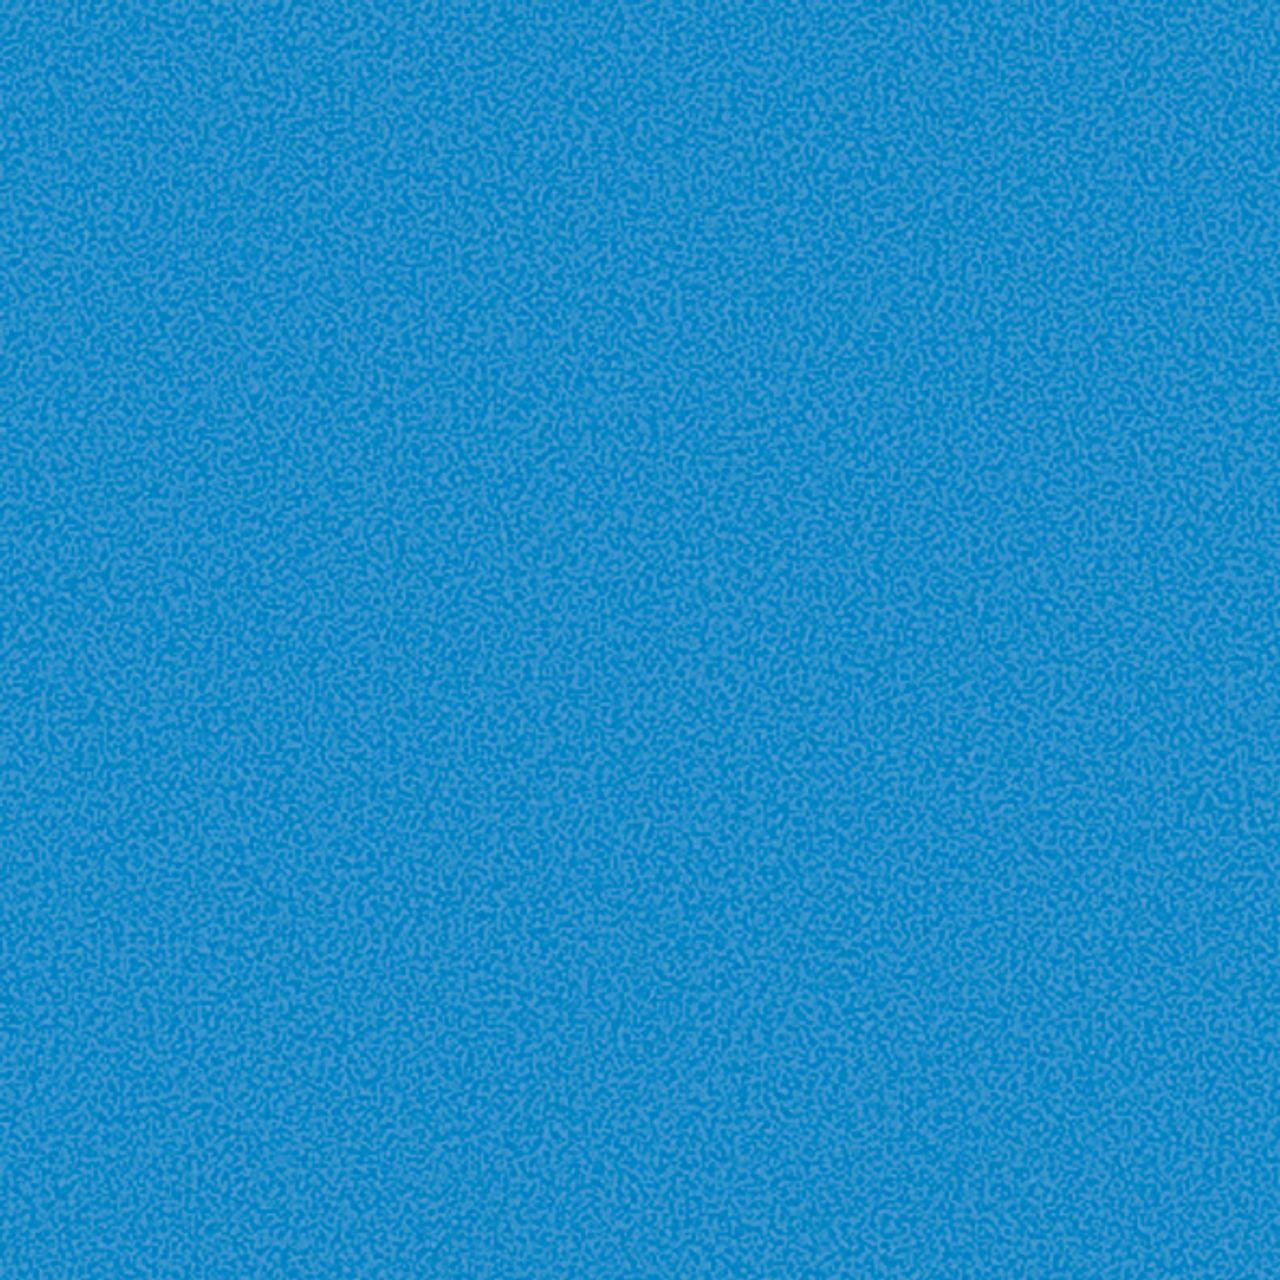 K22.1.6 Royal Blue